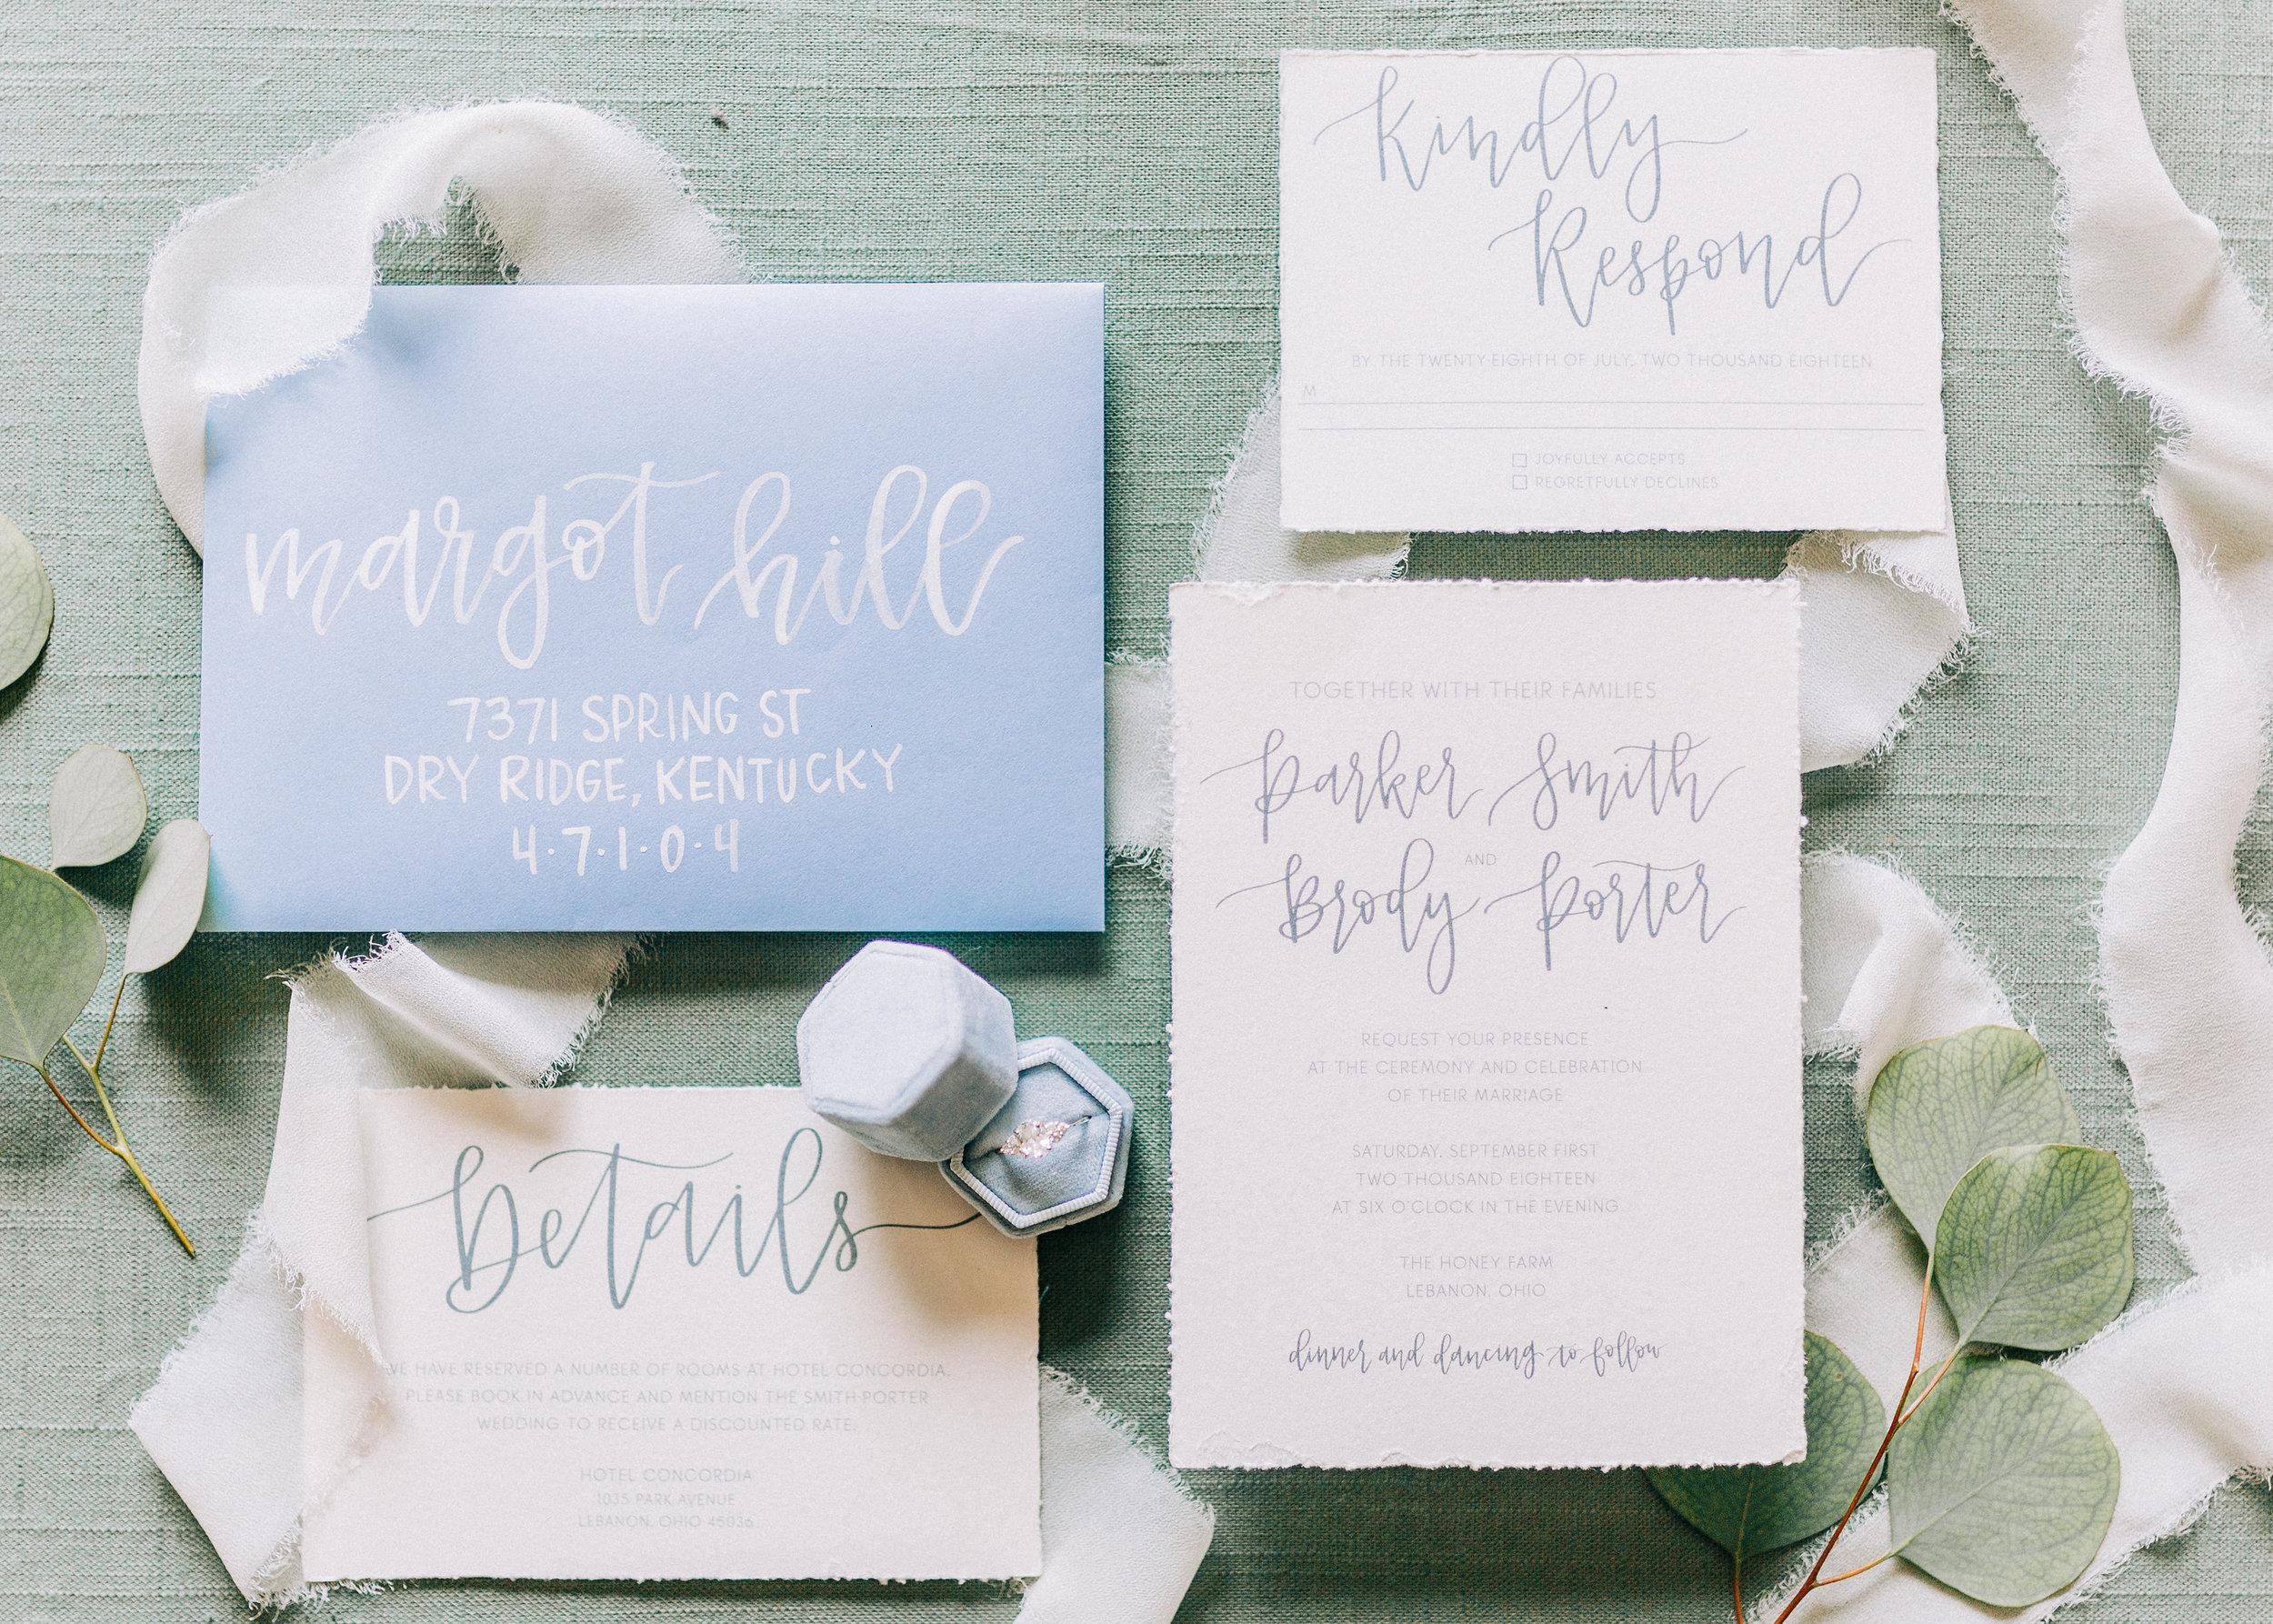 Blue and White Wedding Invitations - Columbus Wedding Planner - Dayton Wedding Coordinator